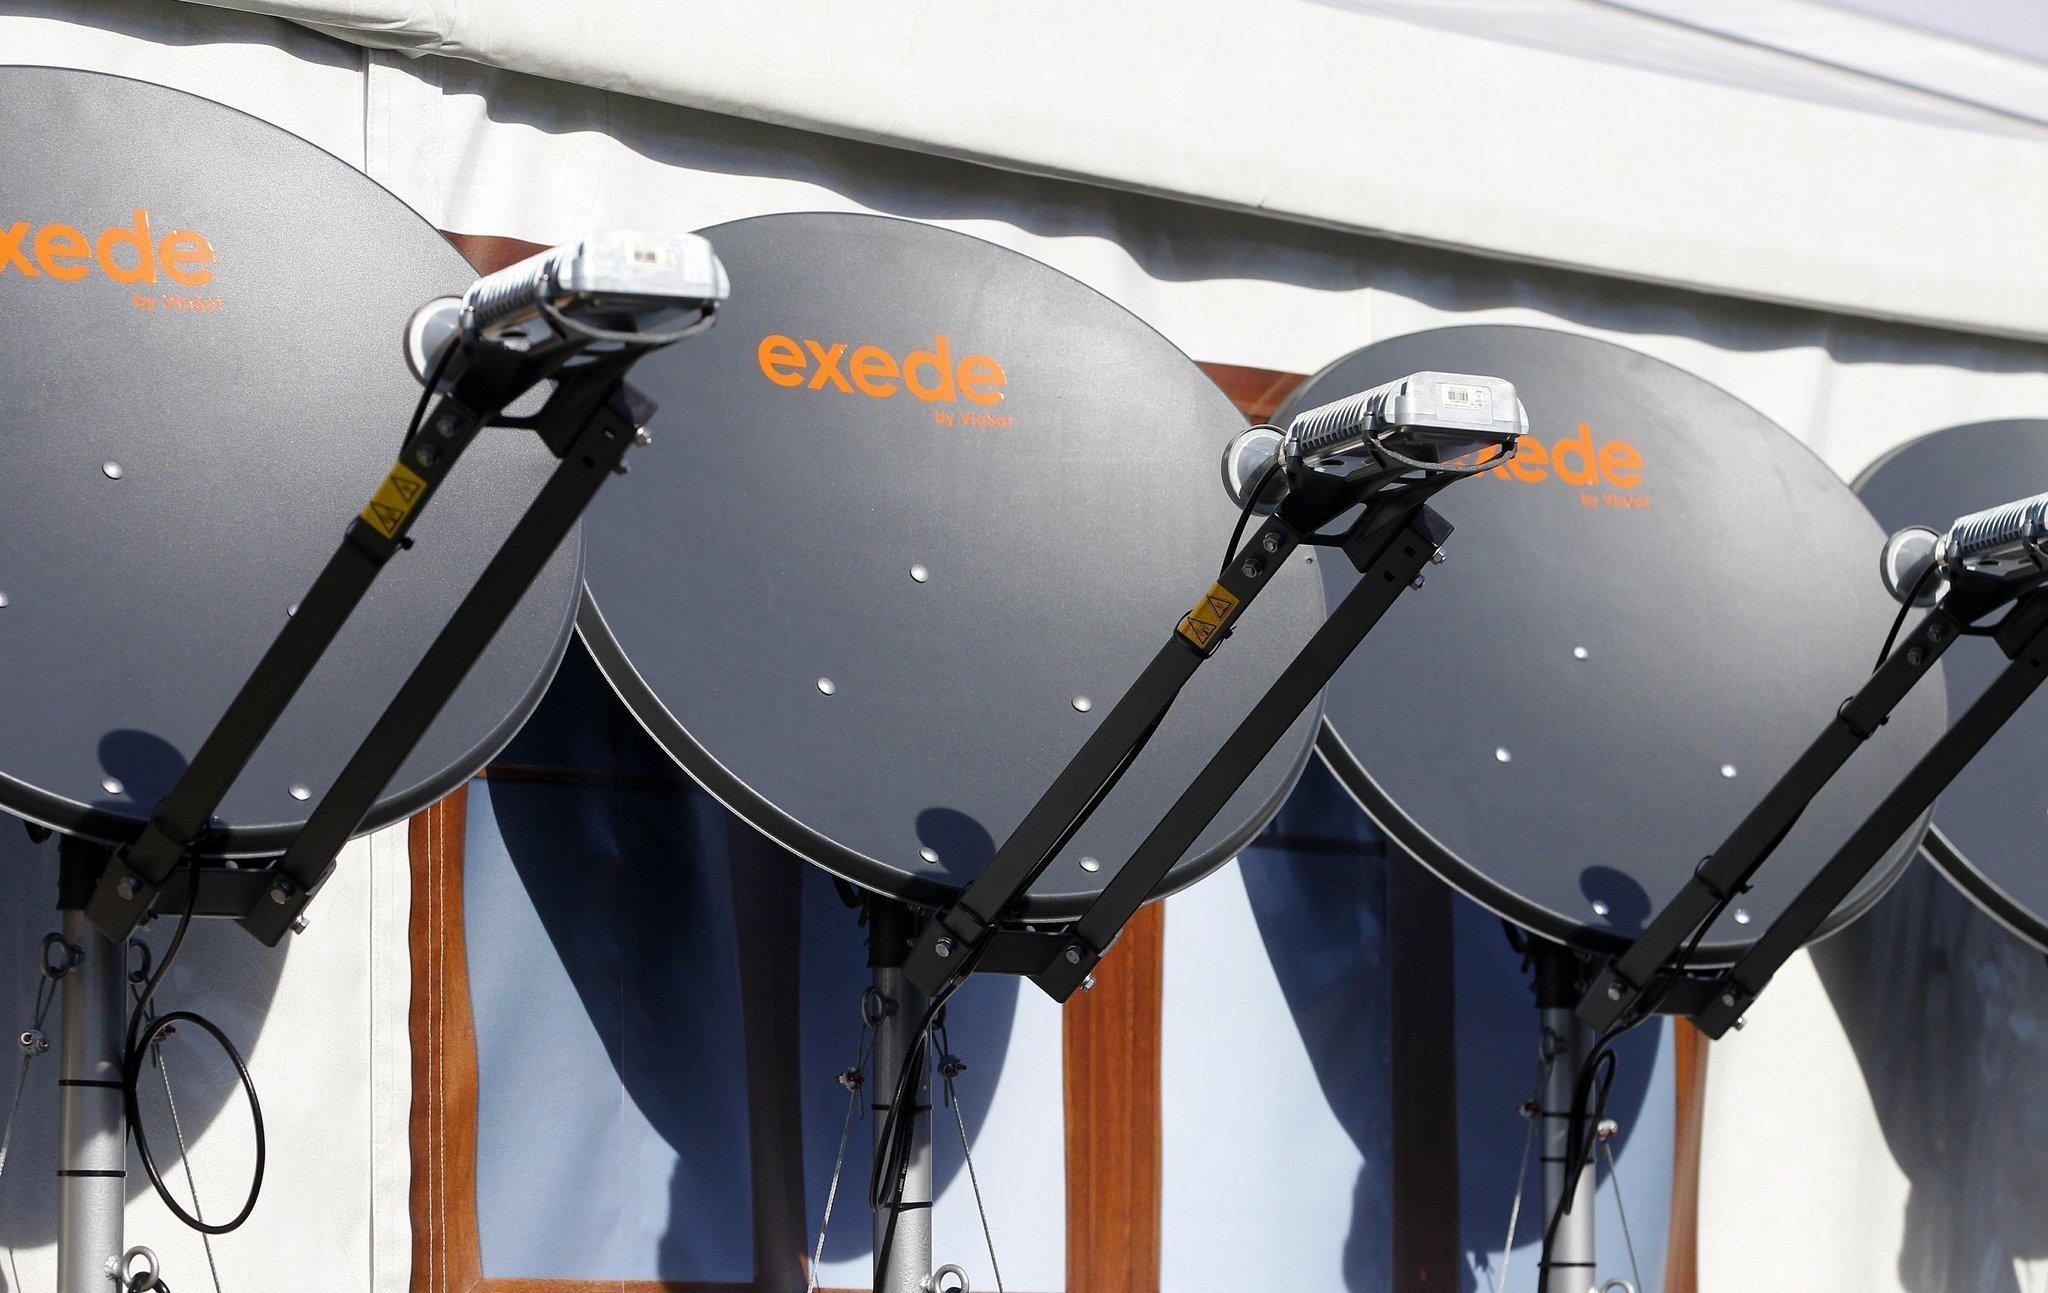 Viasat Deal Brings Exede Satellite Internet To Directv The San